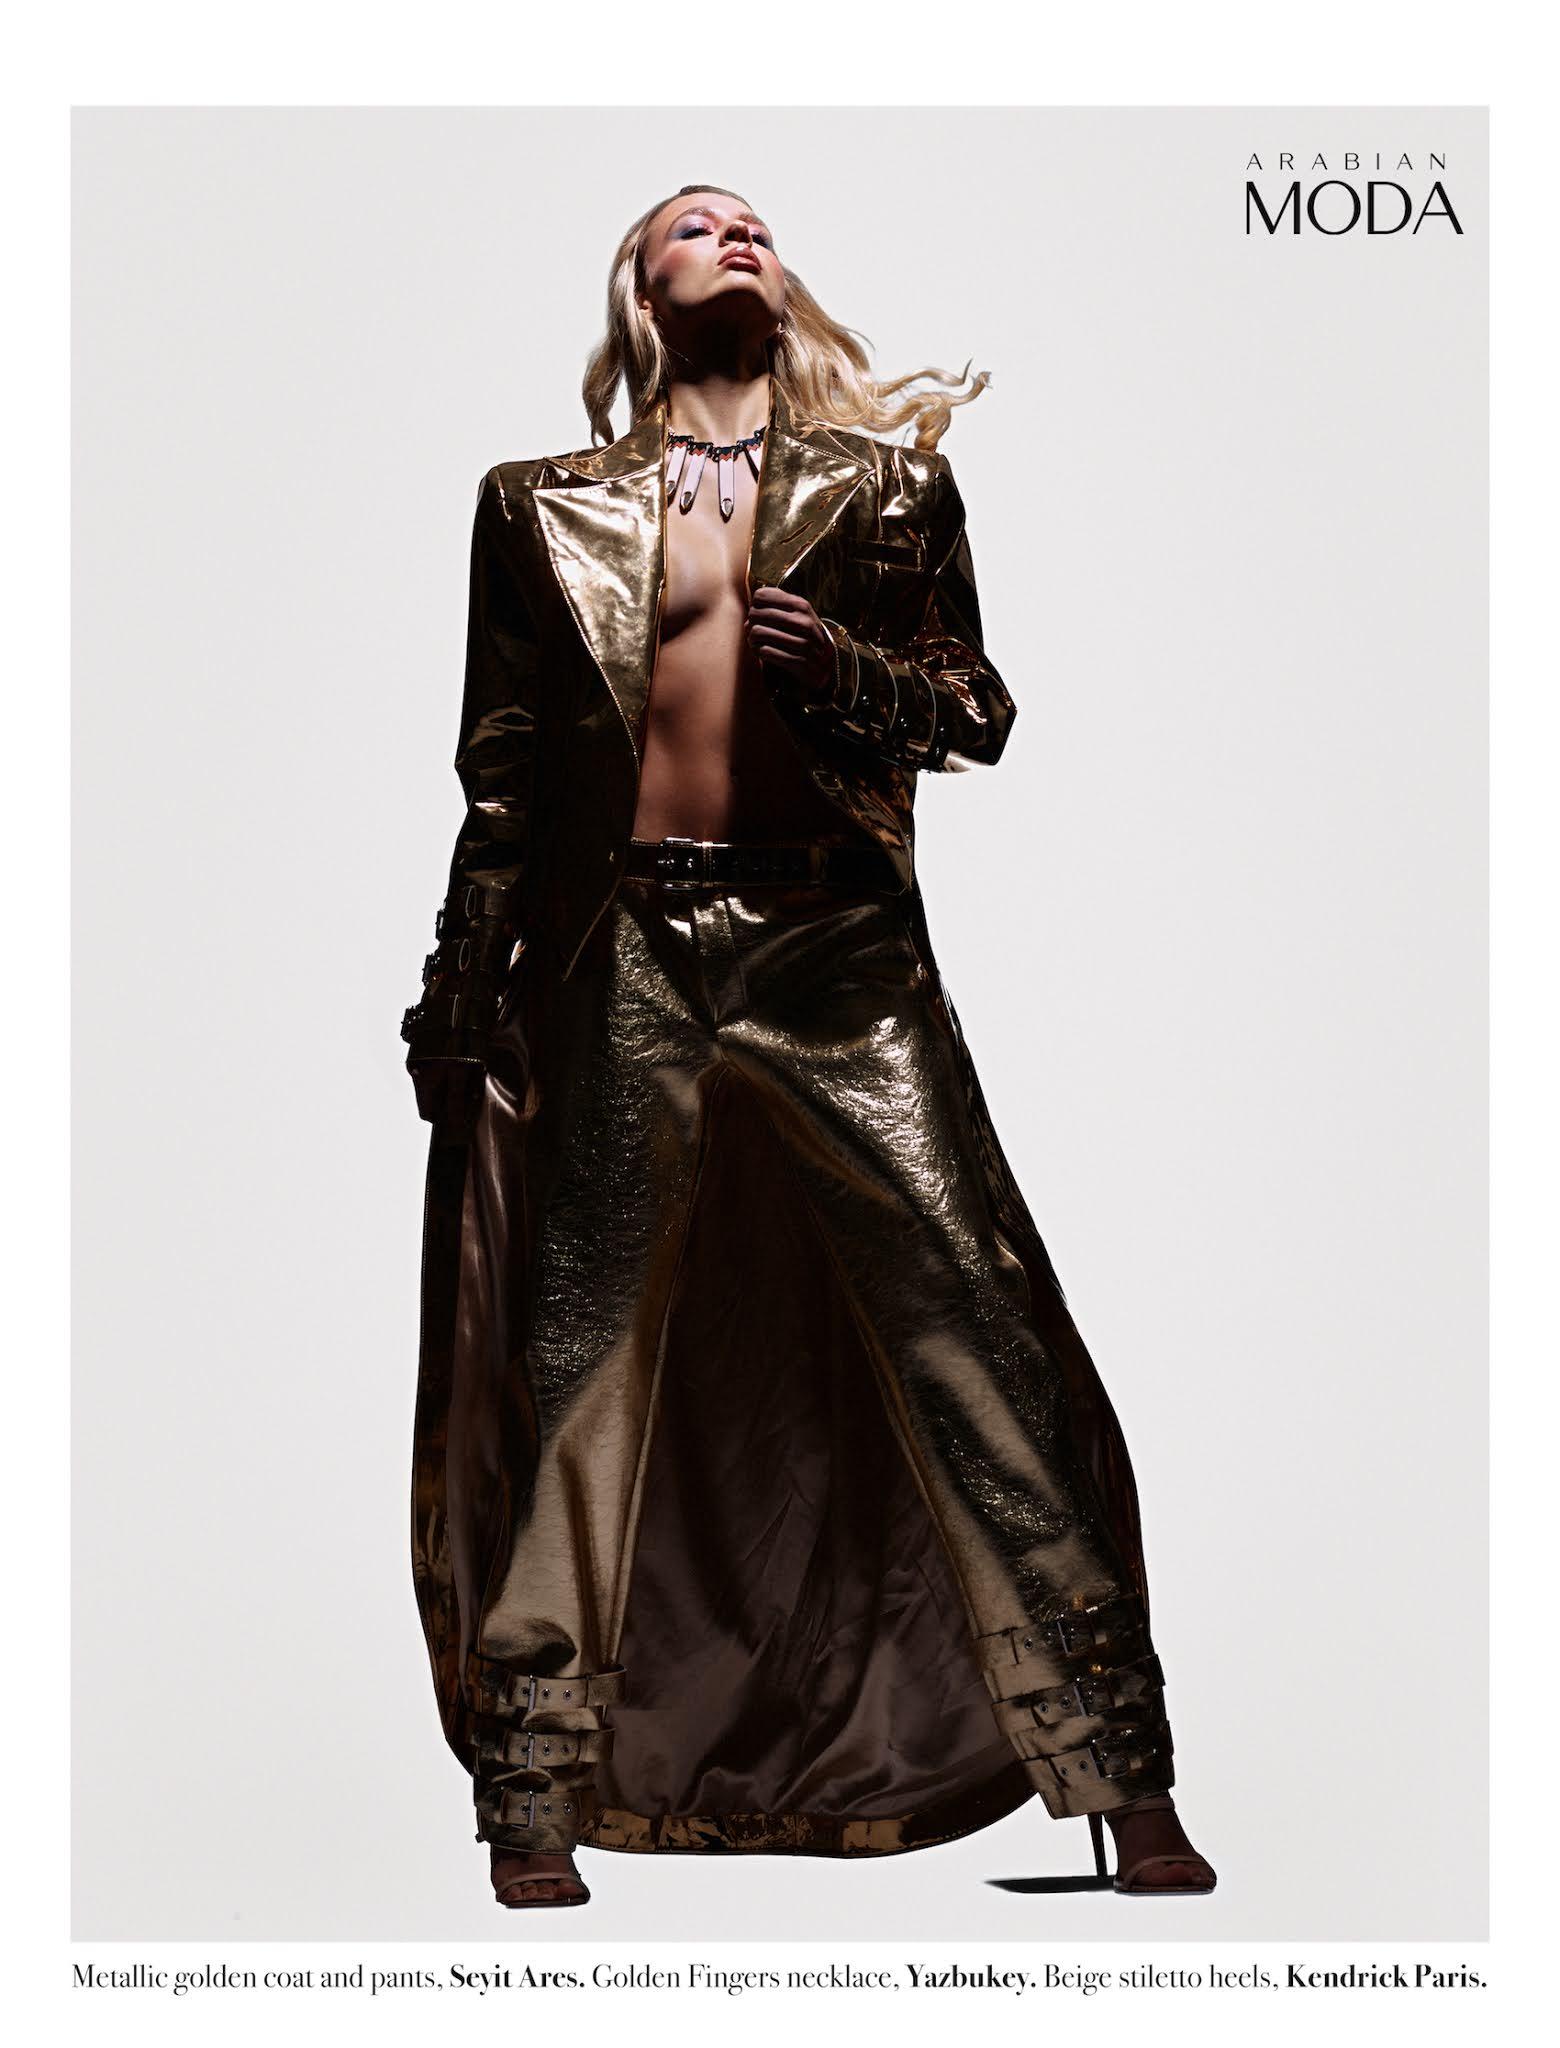 Arabian Moda x Seyit Ares x Yazbukey